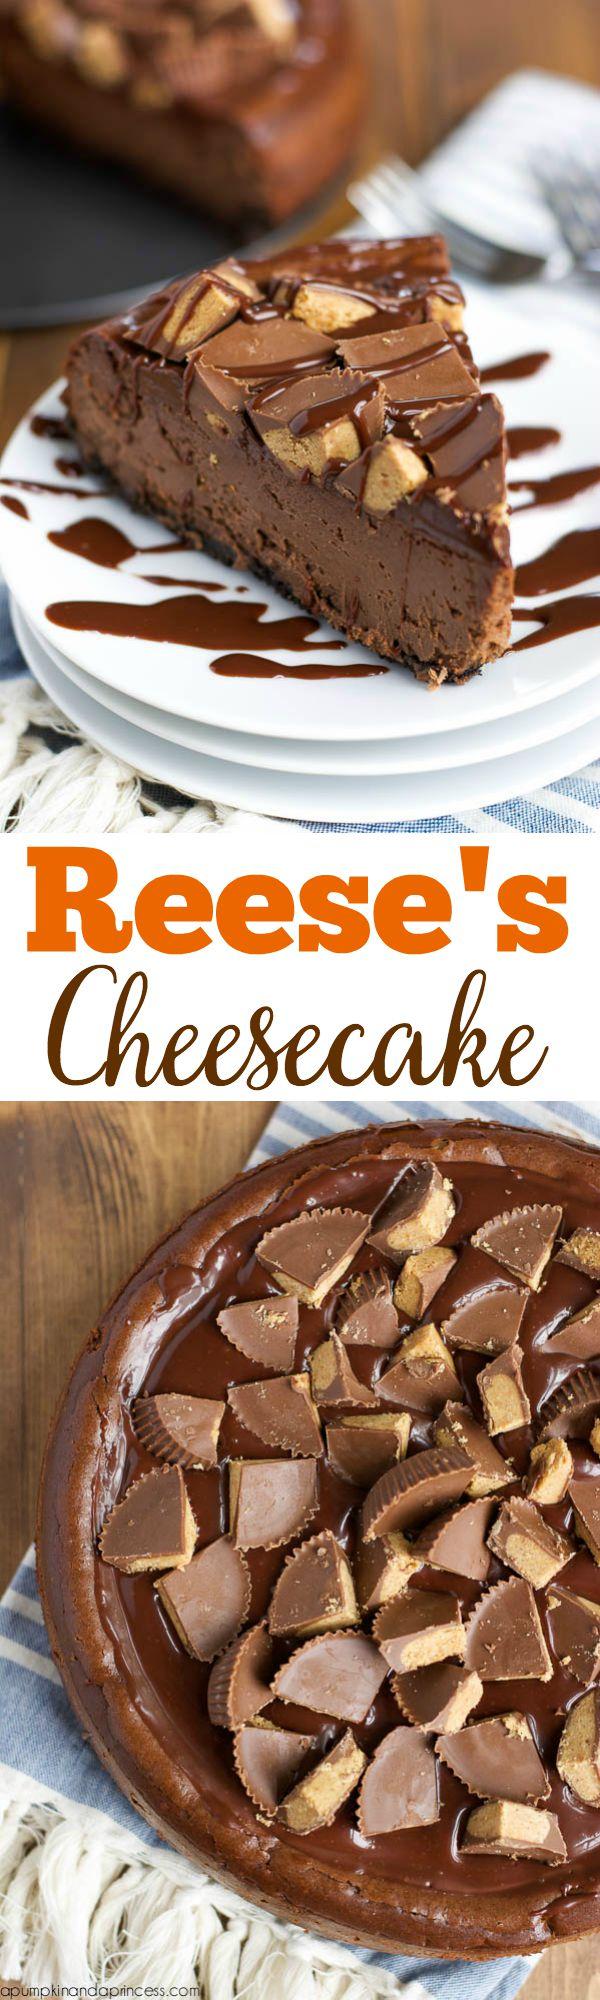 Reese's Chocolate Cheesecake